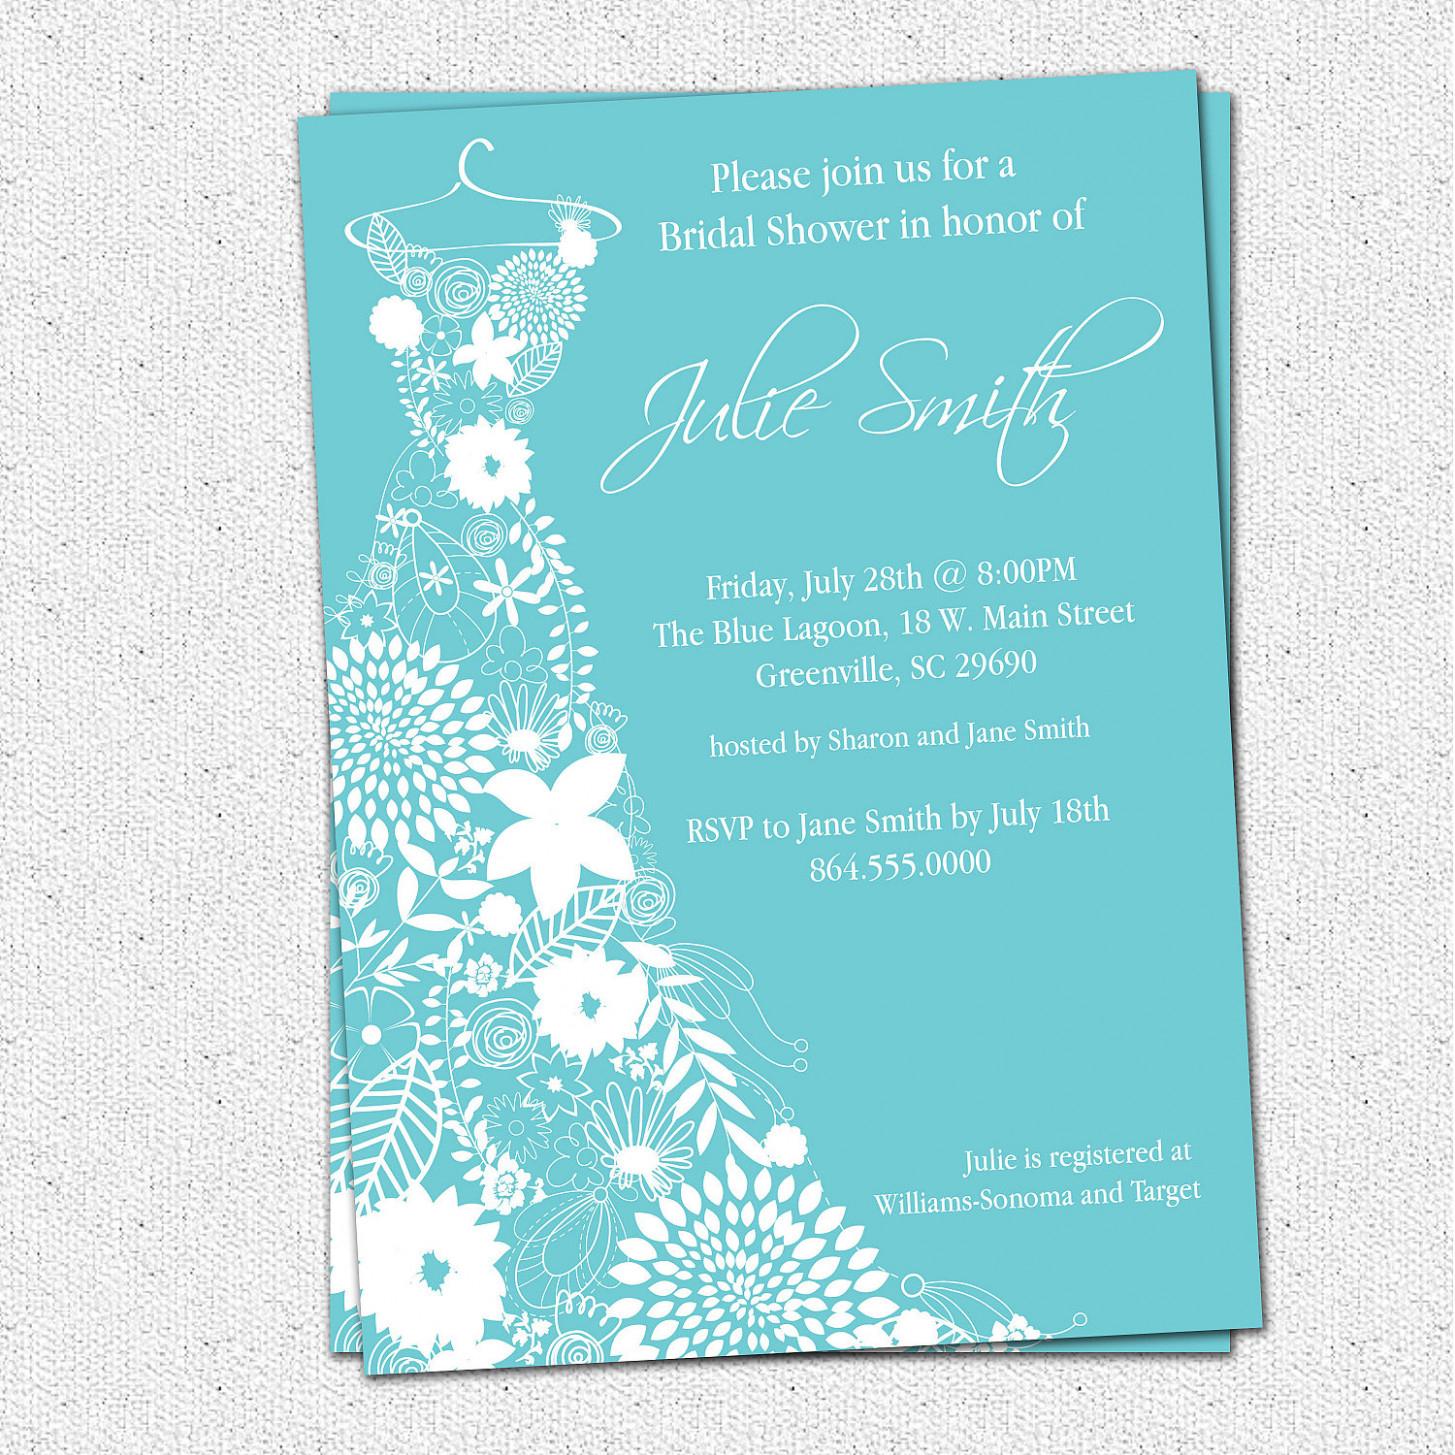 Free Printable Bridal Shower Invitations Template | Best Template - Free Printable Bridal Shower Invitations Templates